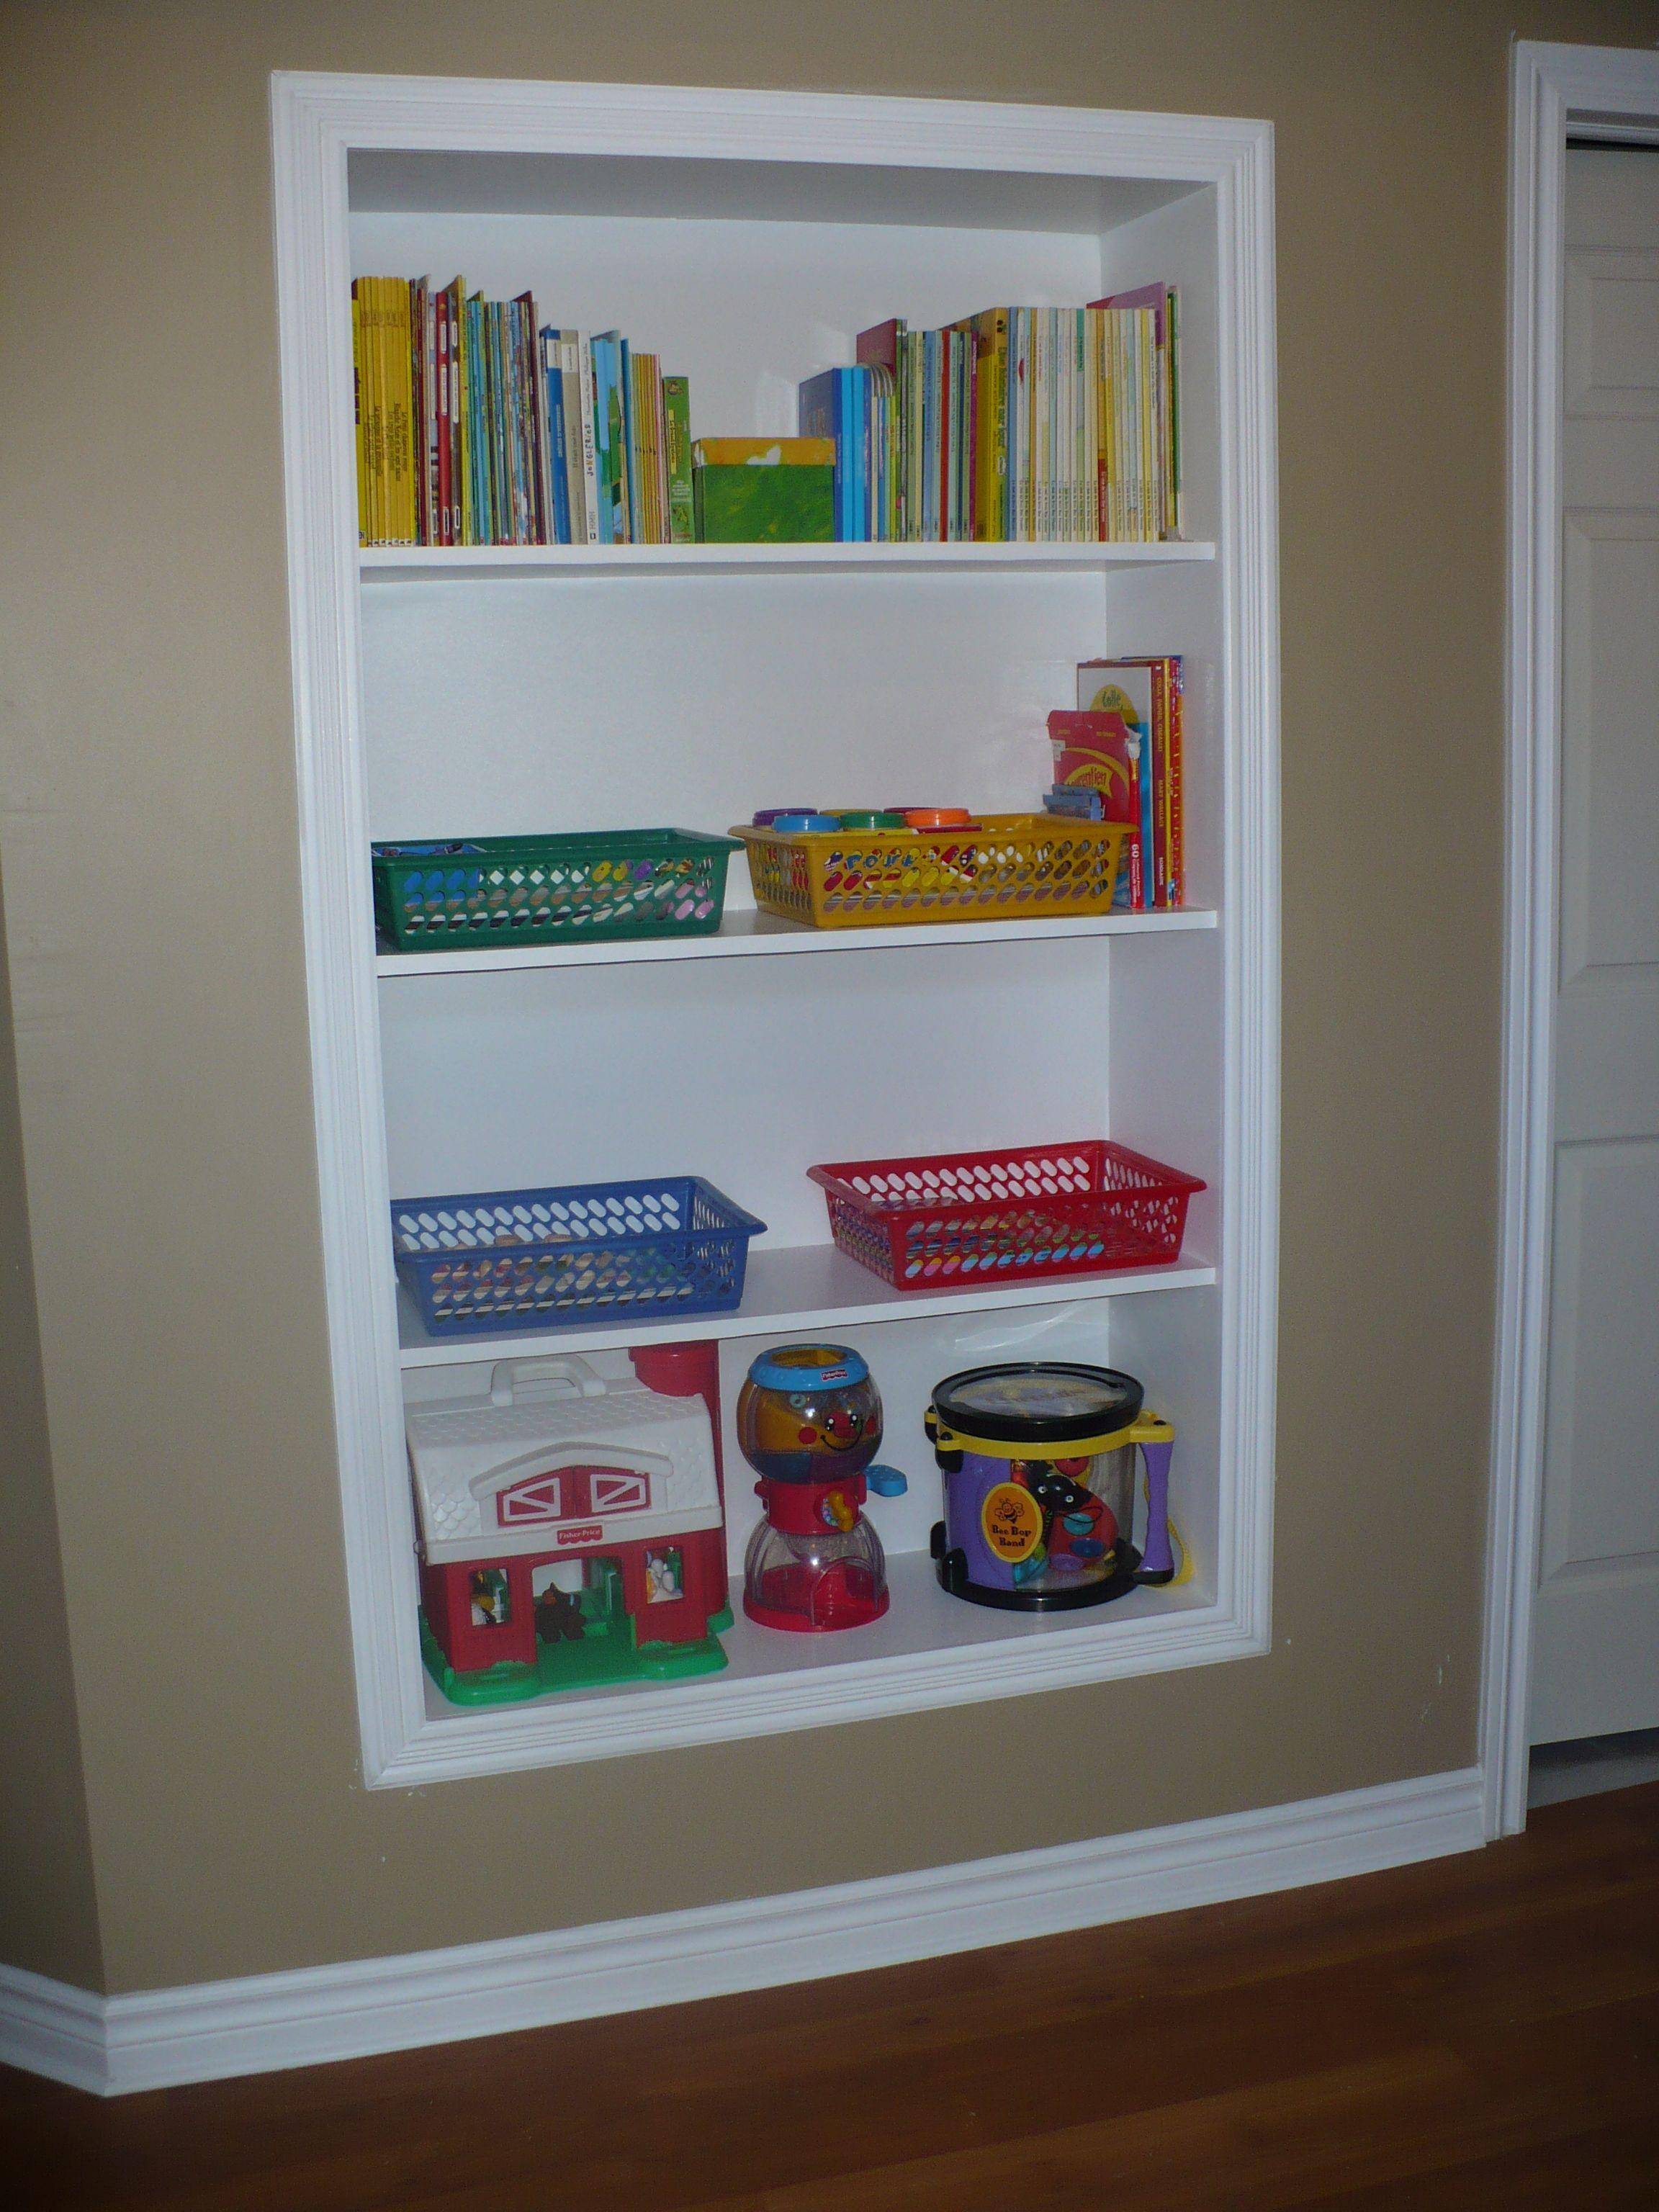 ma biblioth que encastr e dans la salle de jeu sauve de l. Black Bedroom Furniture Sets. Home Design Ideas